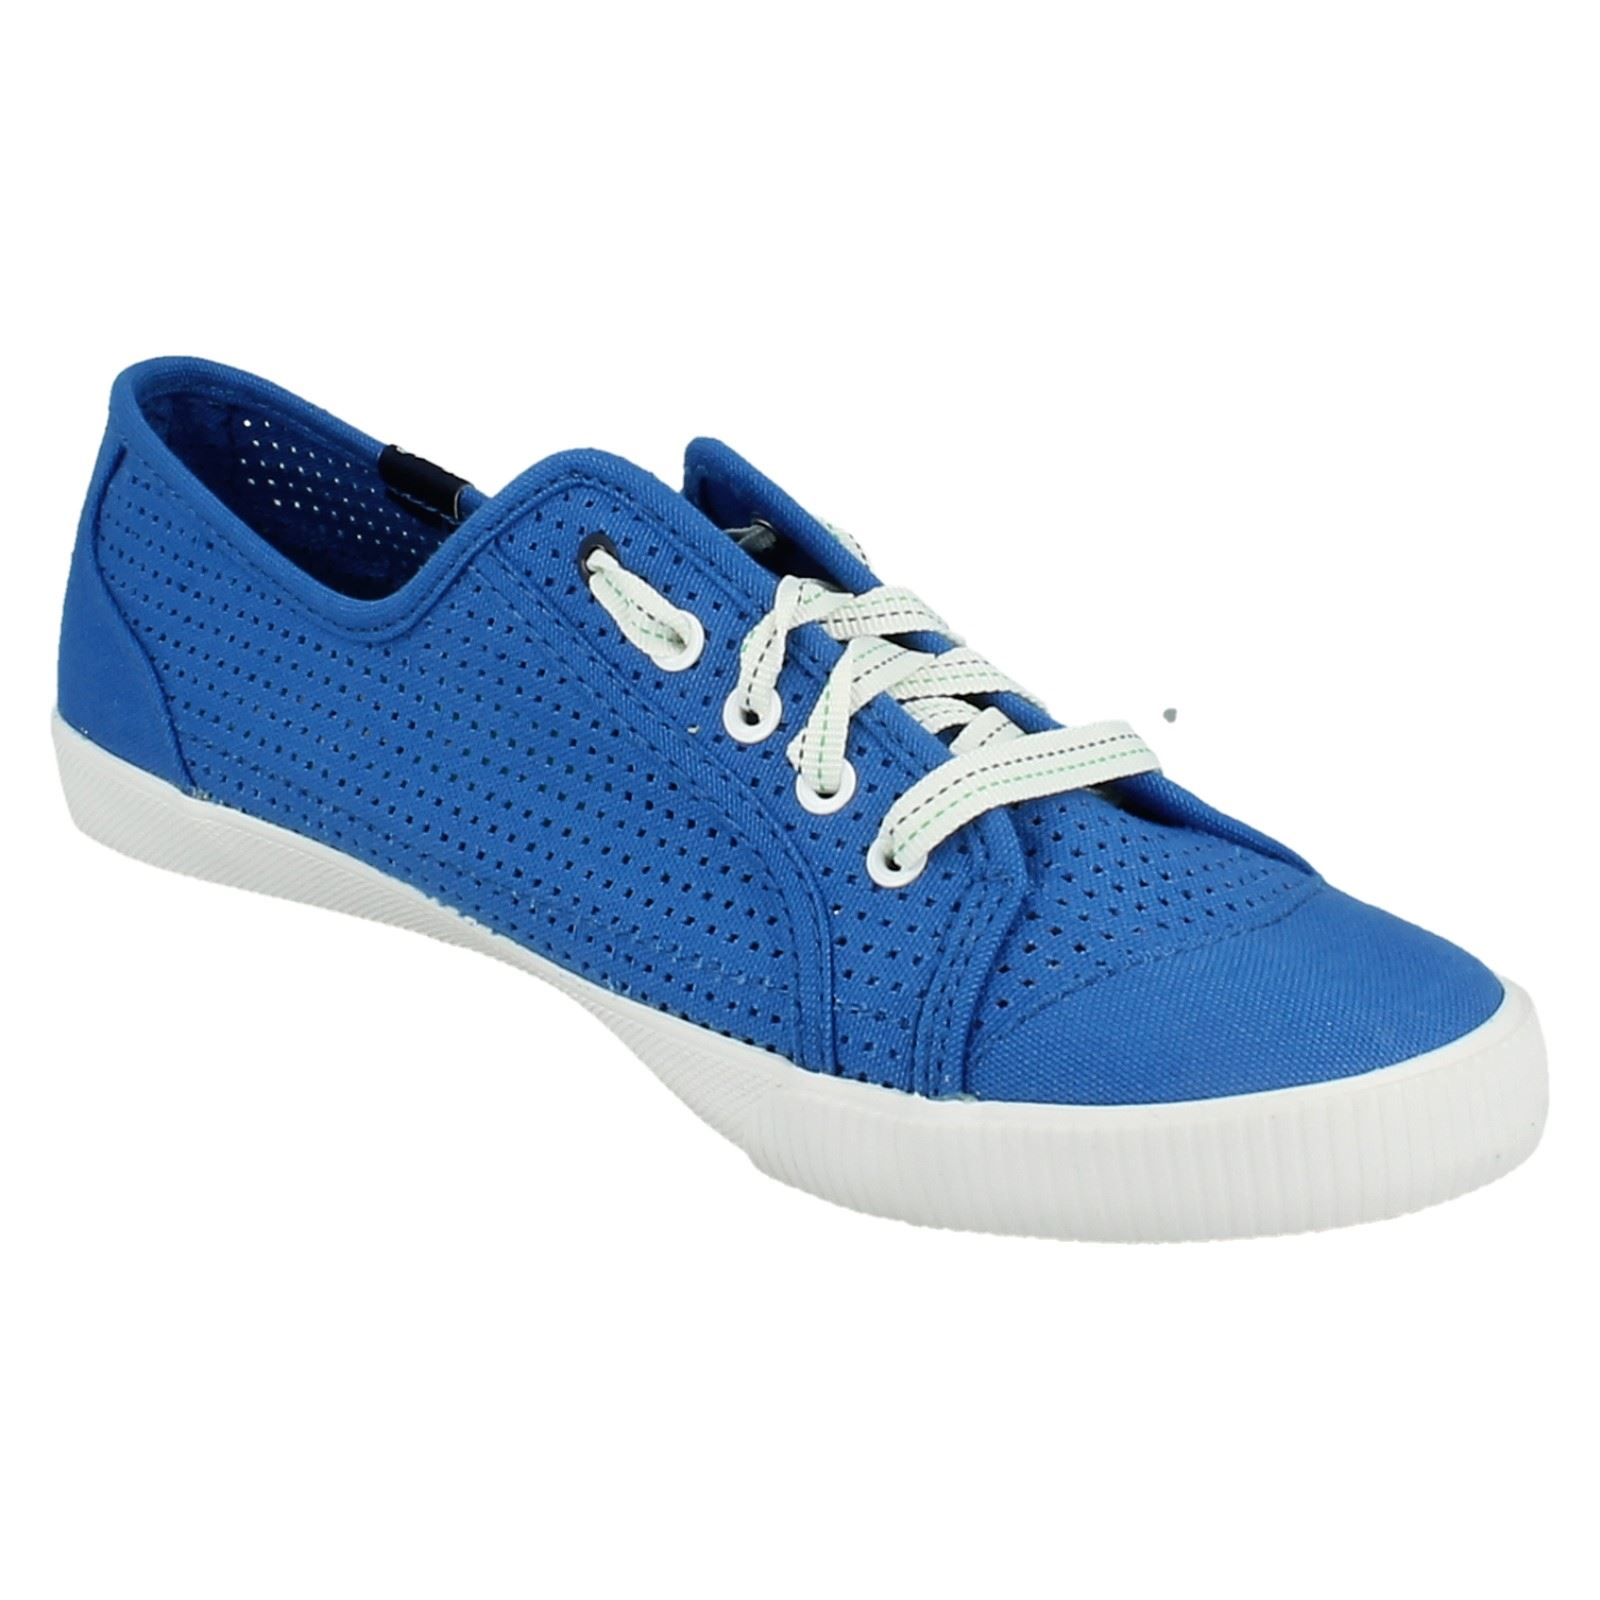 Flat Shoes Cvs